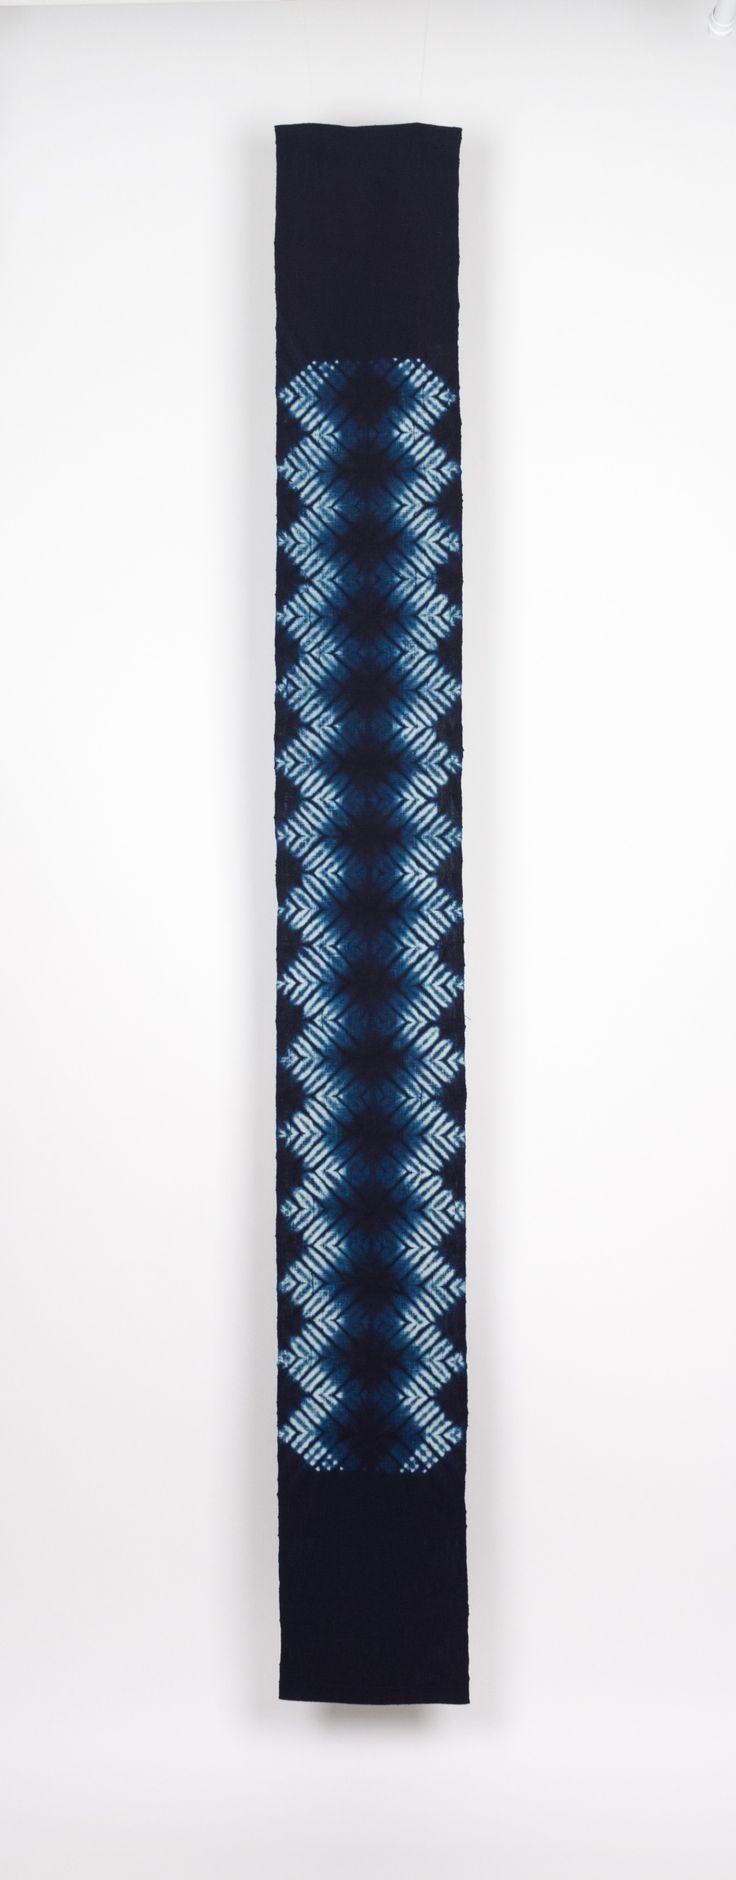 pingl par lena sur indigo tye dry teinture teinture tissu et teinture naturelle. Black Bedroom Furniture Sets. Home Design Ideas